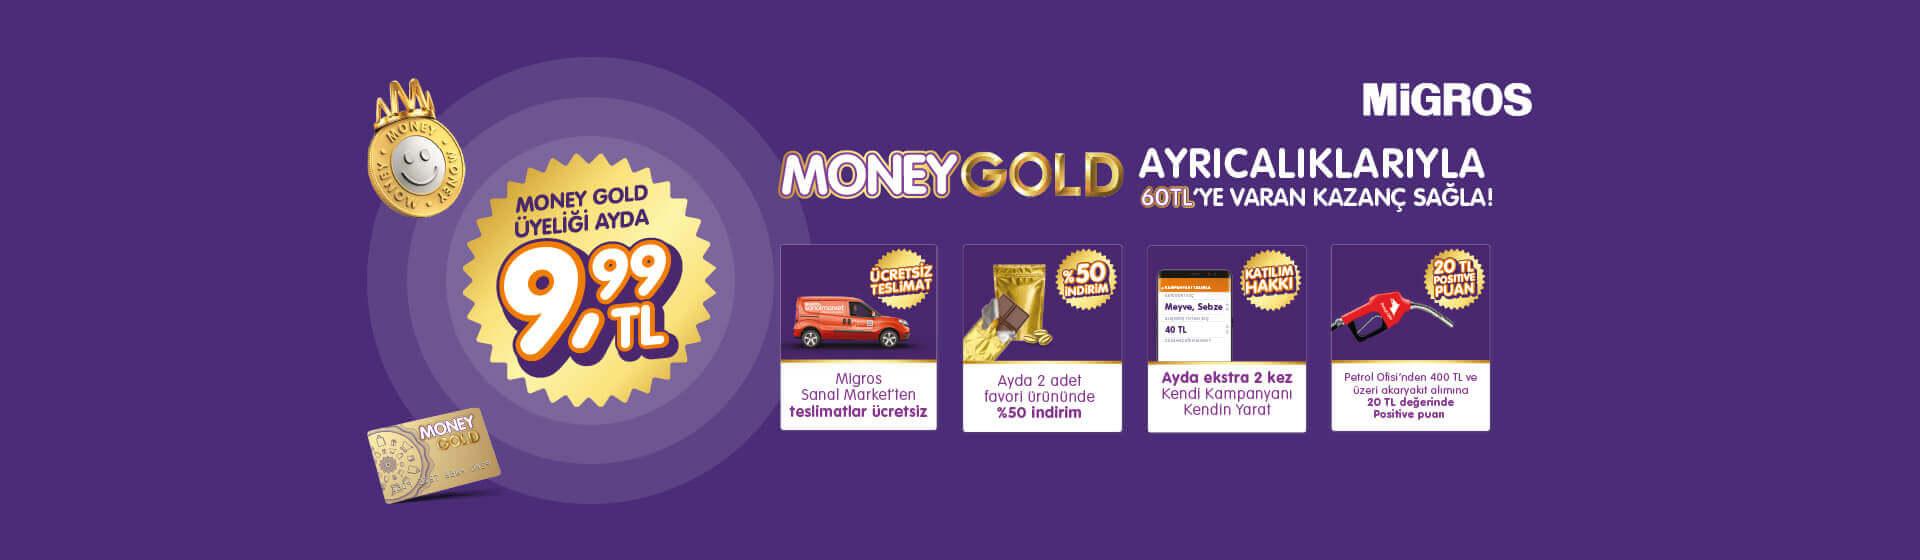 Money Gold ana sayfa